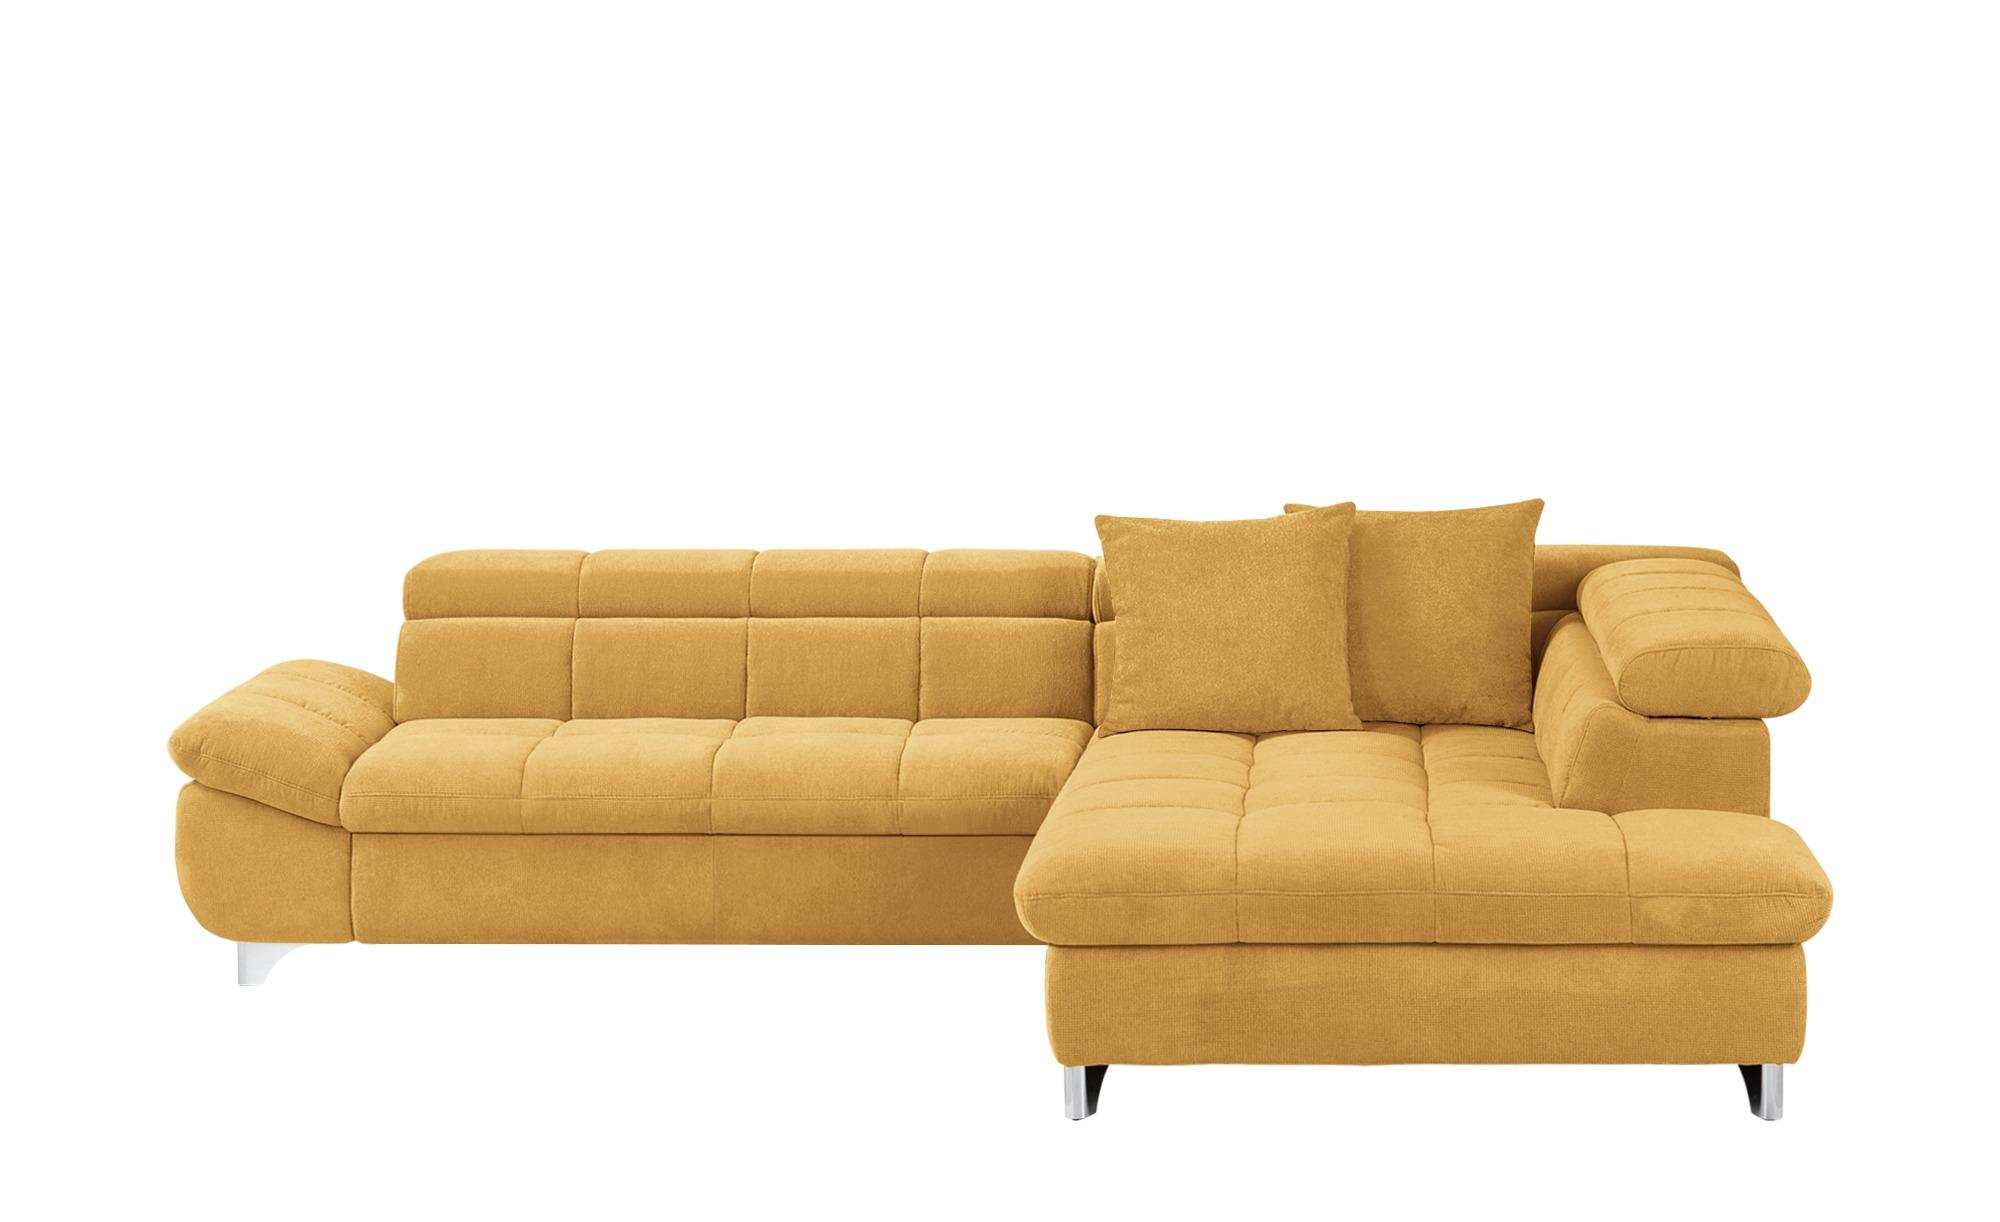 uno Ecksofa  Lorena ¦ gelb ¦ Maße (cm): H: 79 Polstermöbel > Sofas > Ecksofas - Höffner